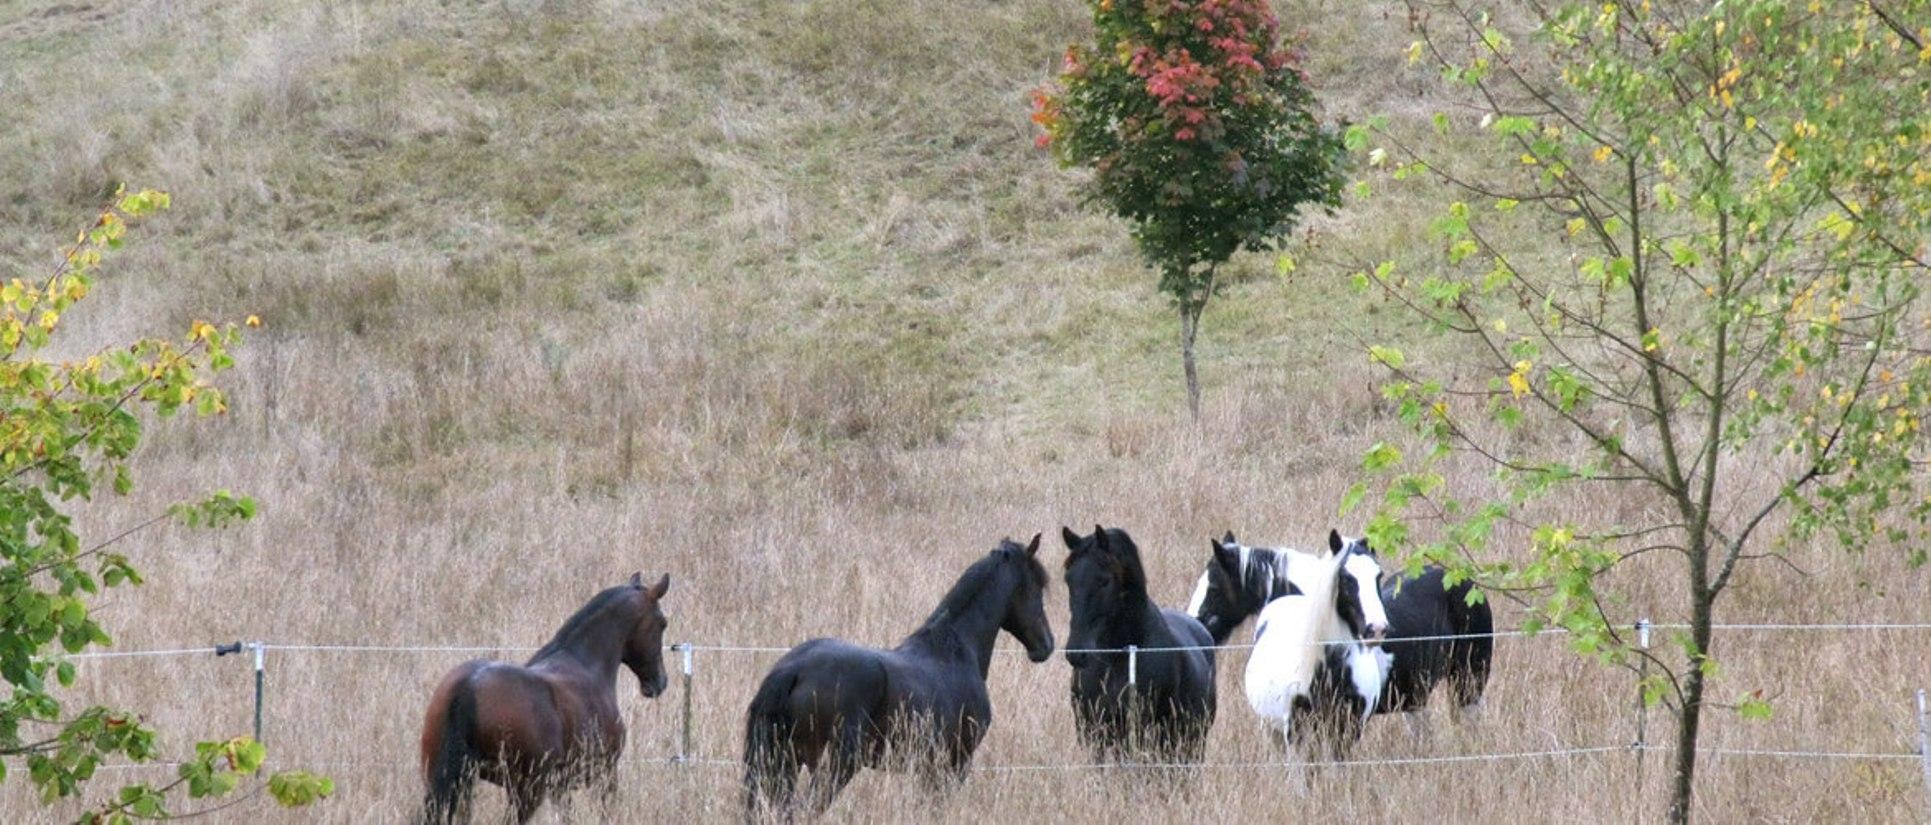 kentaur5_pferdetraining_pferde